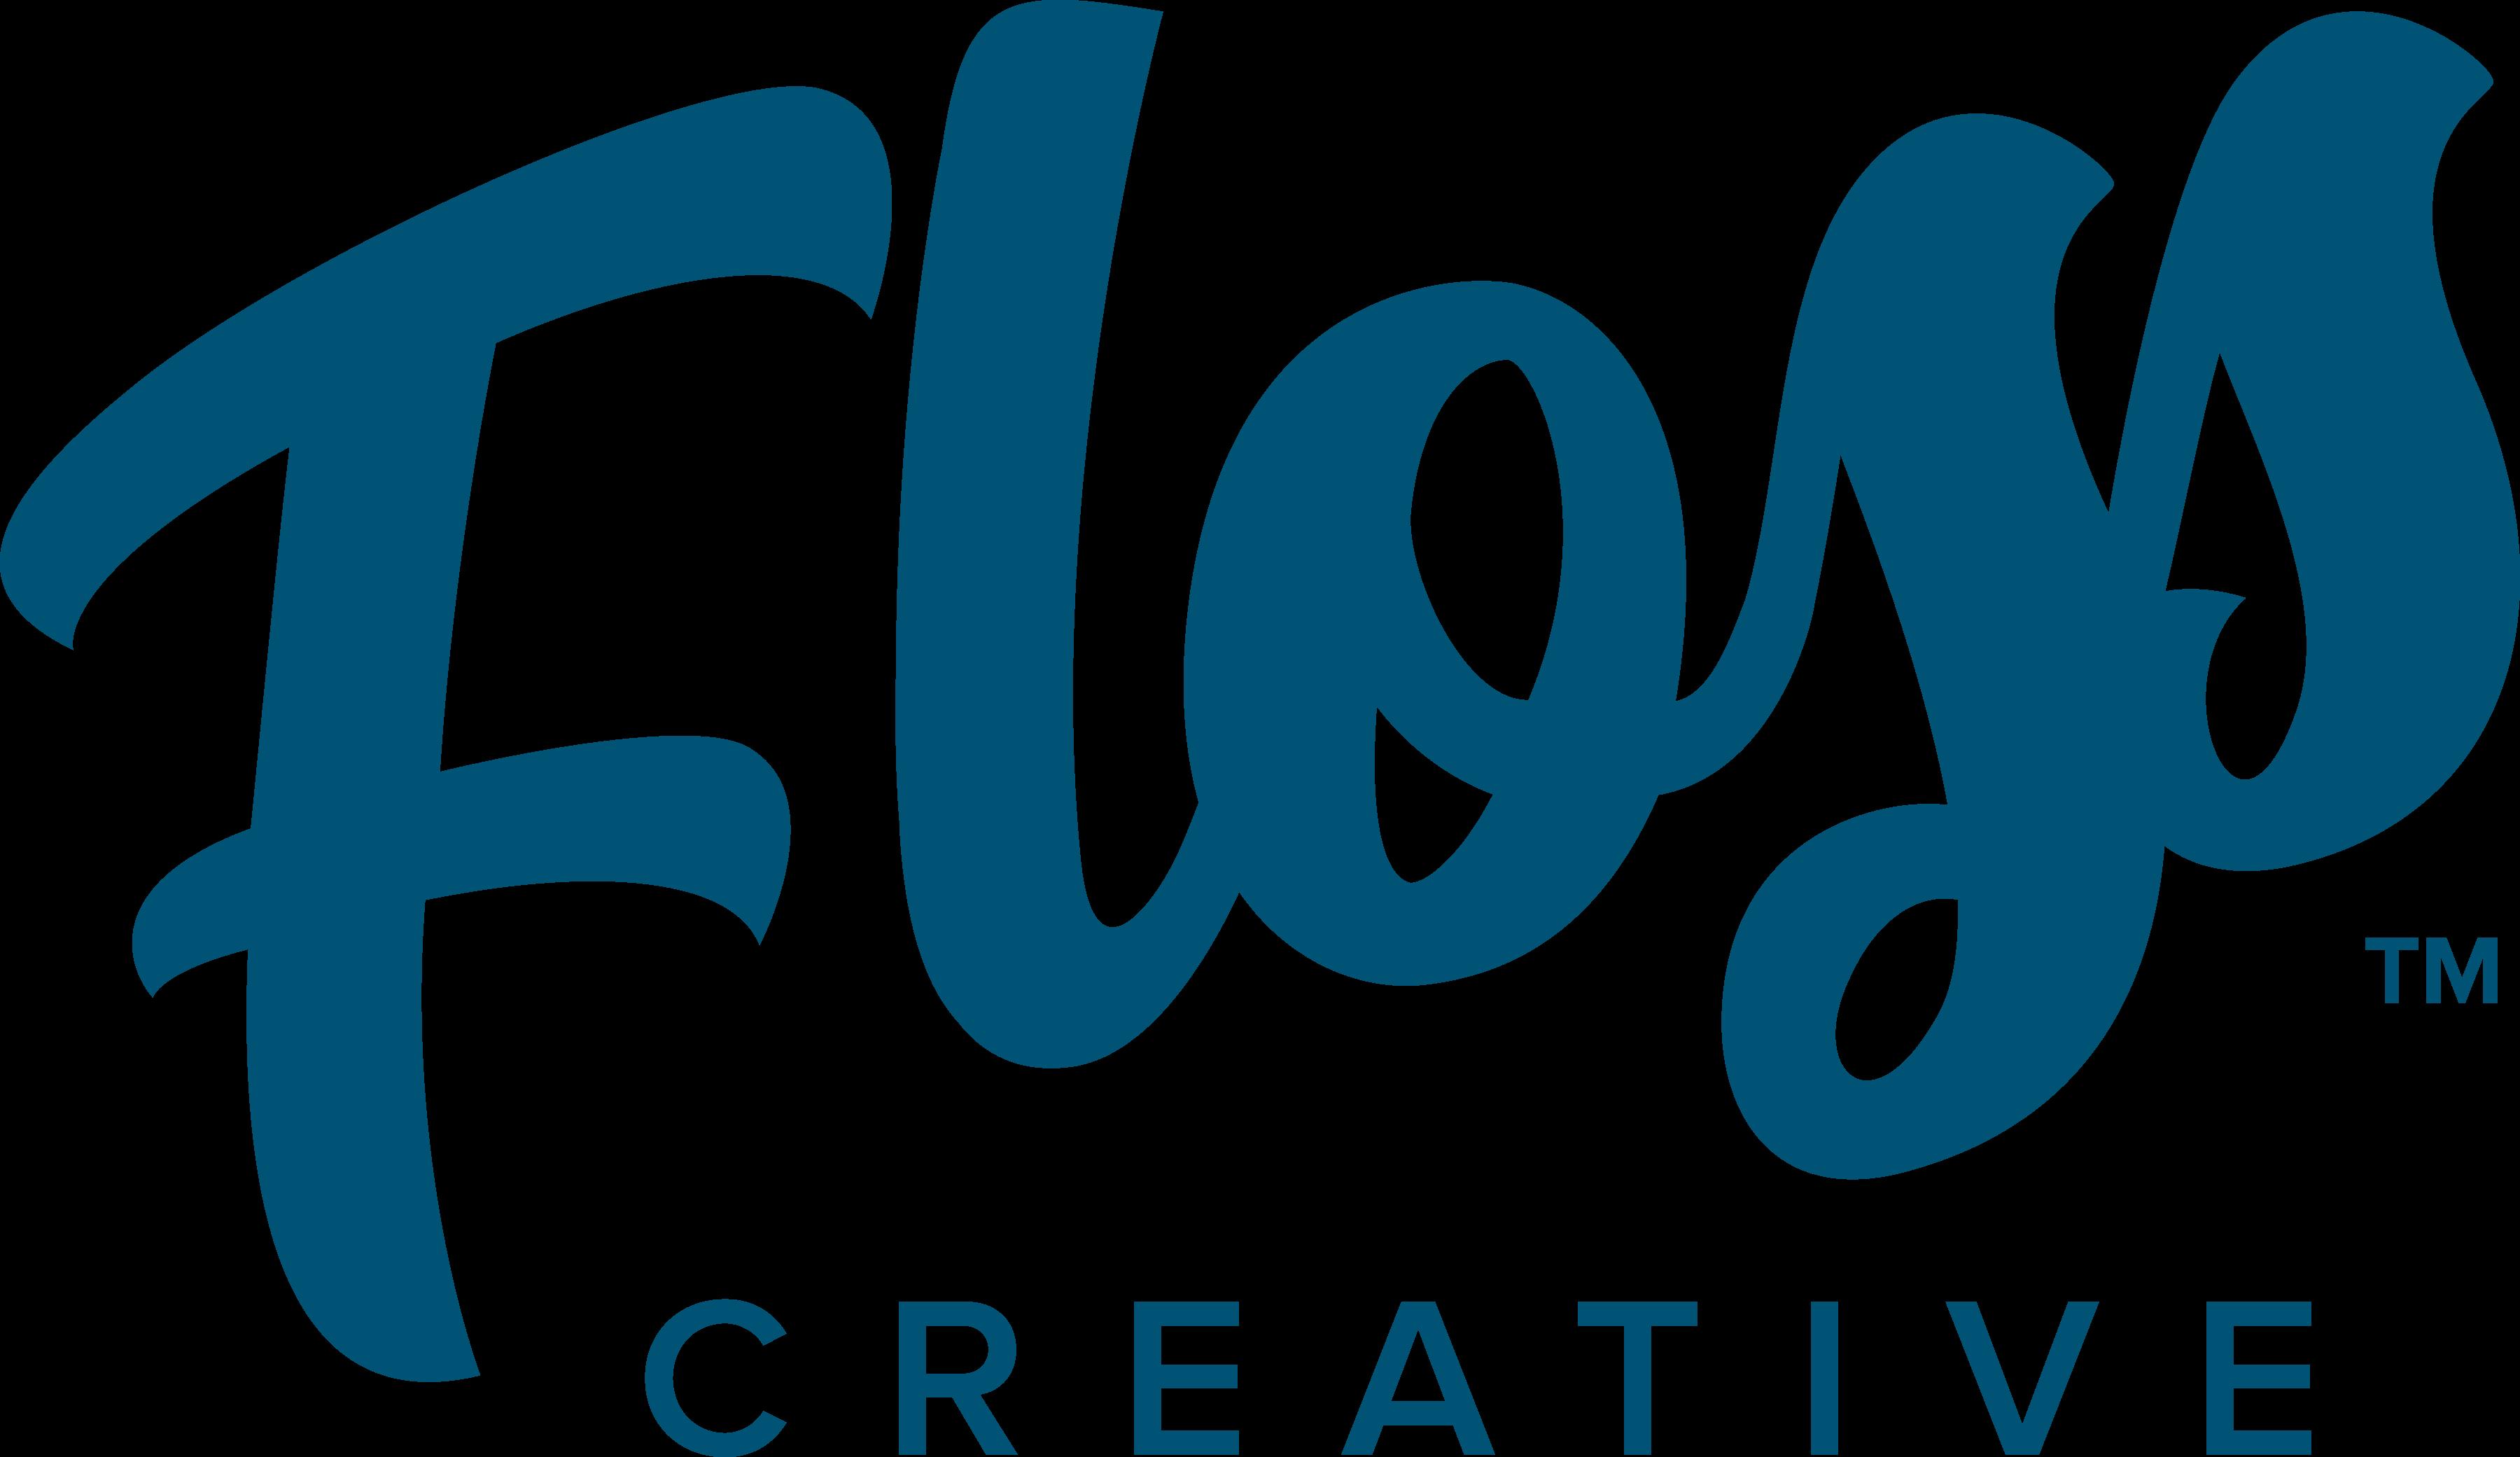 Floss Creative